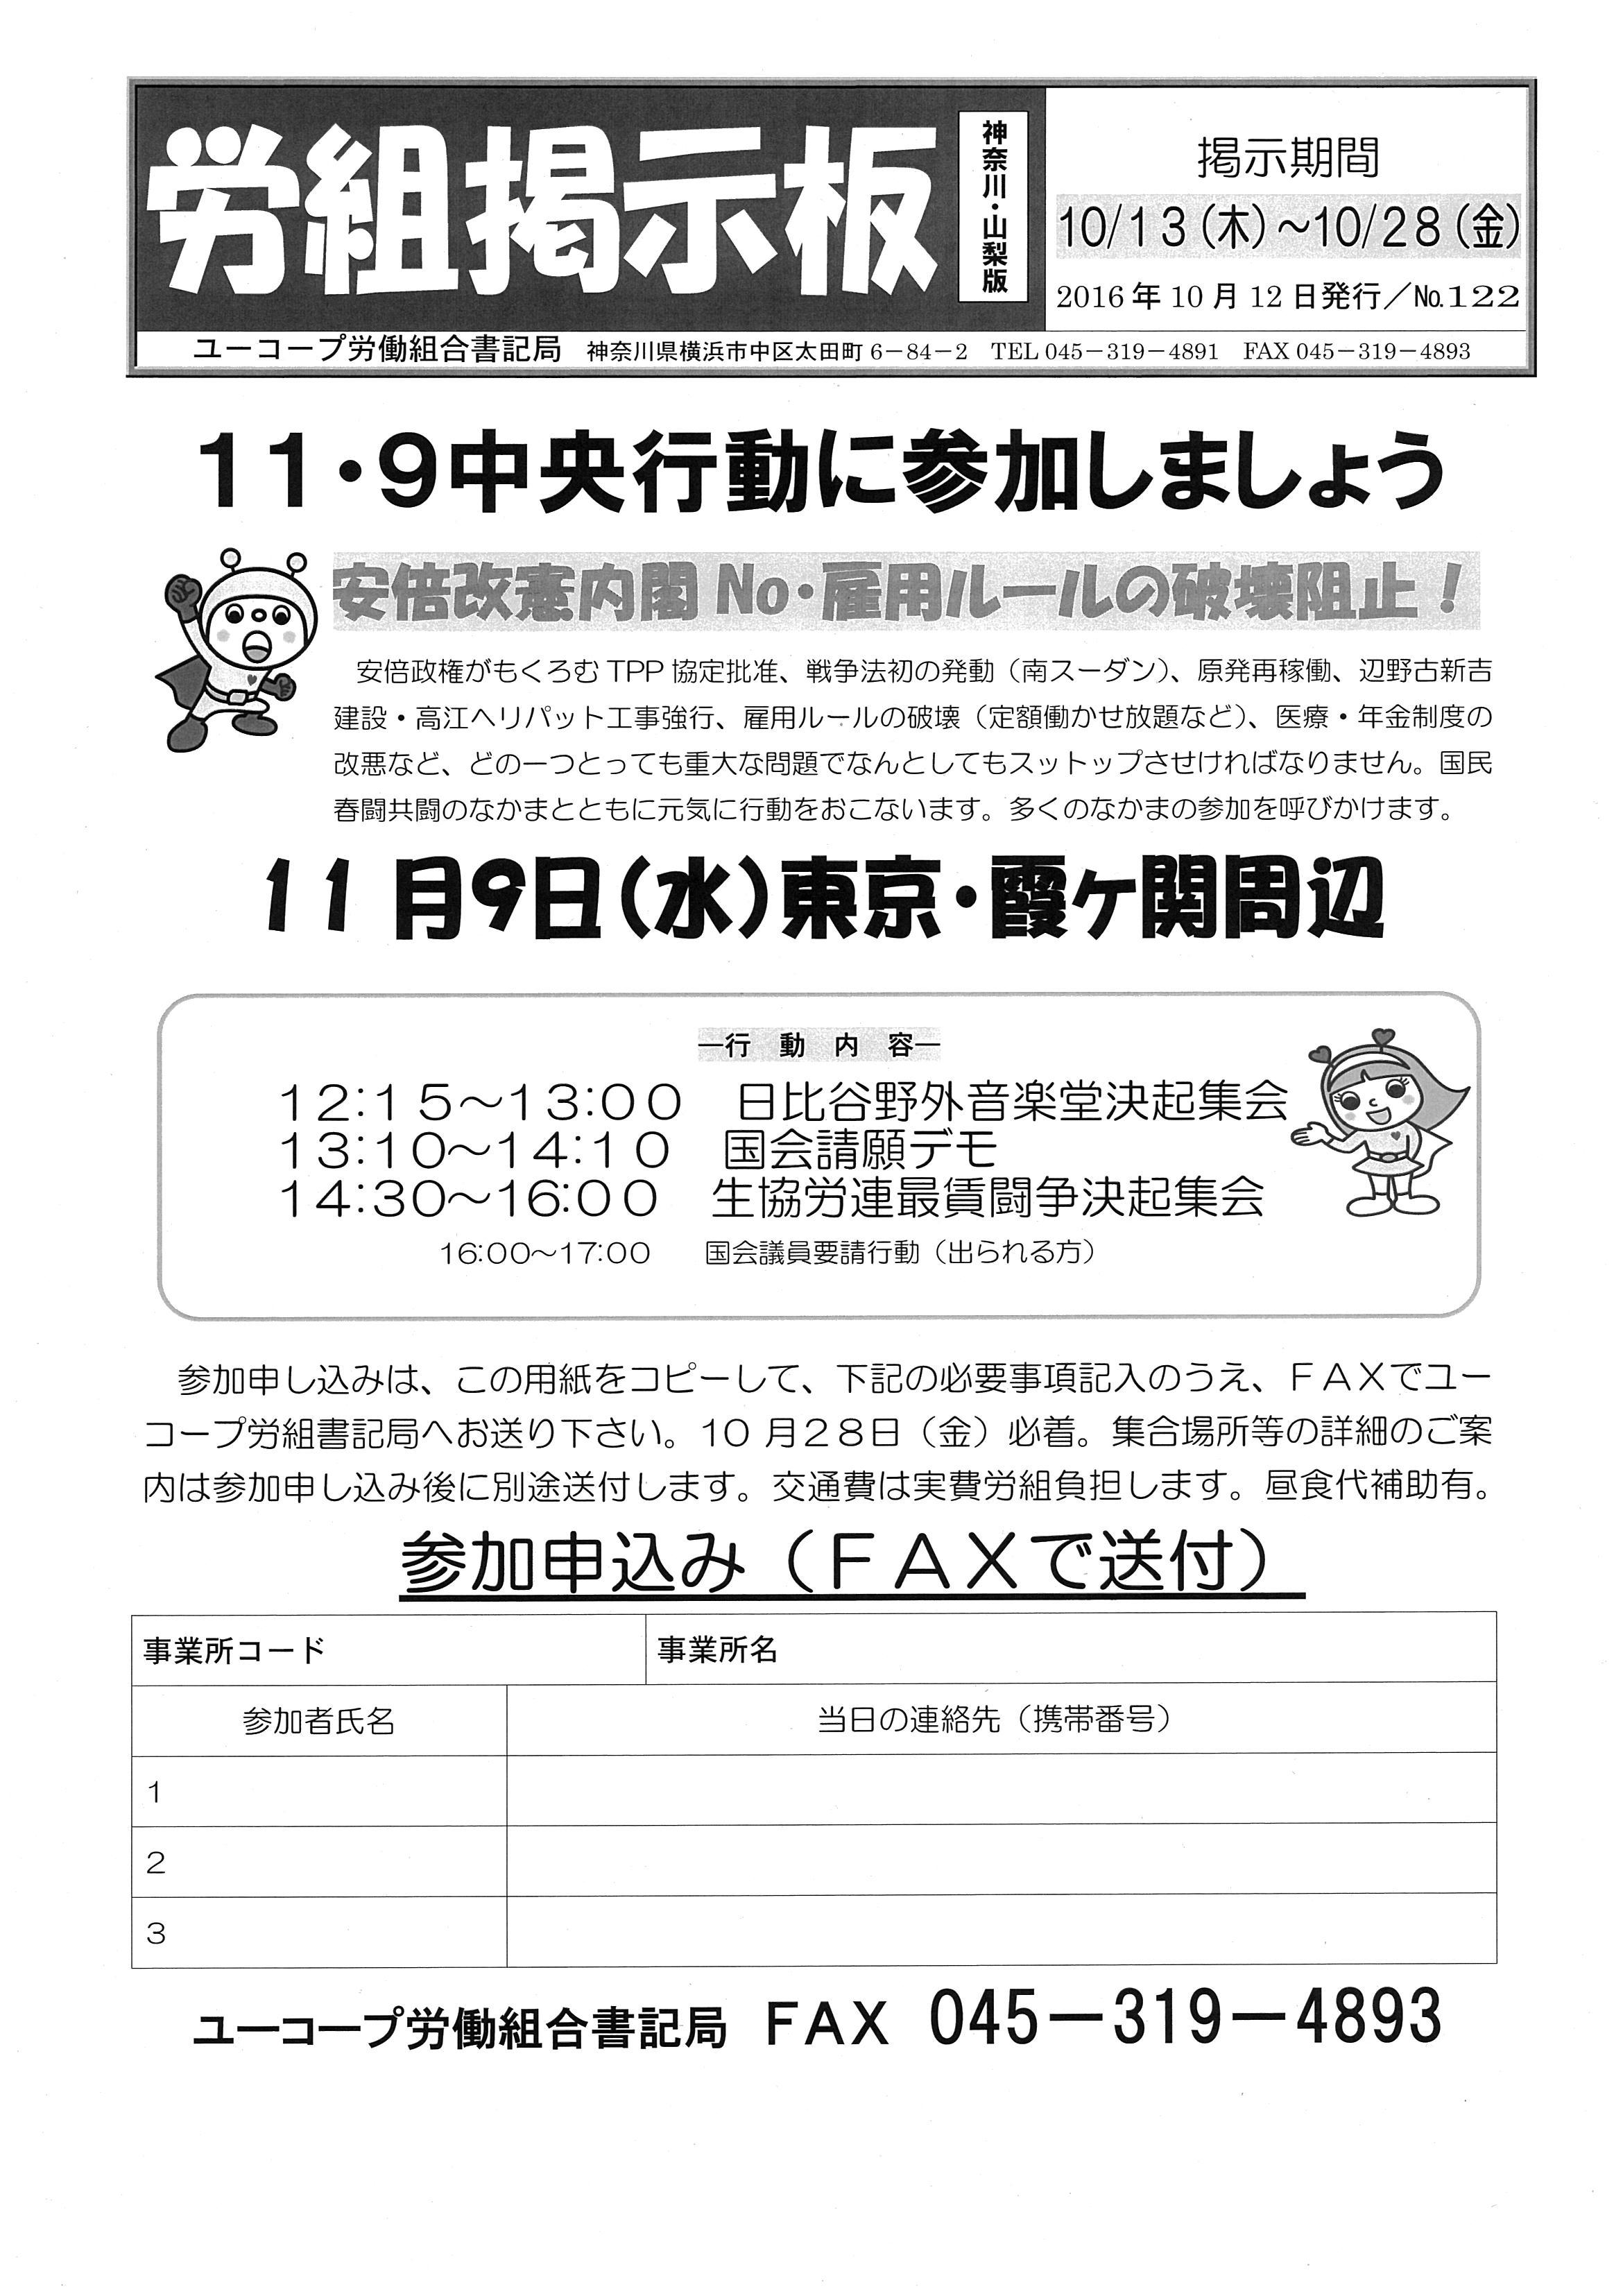 2016keijiban122-1.jpg